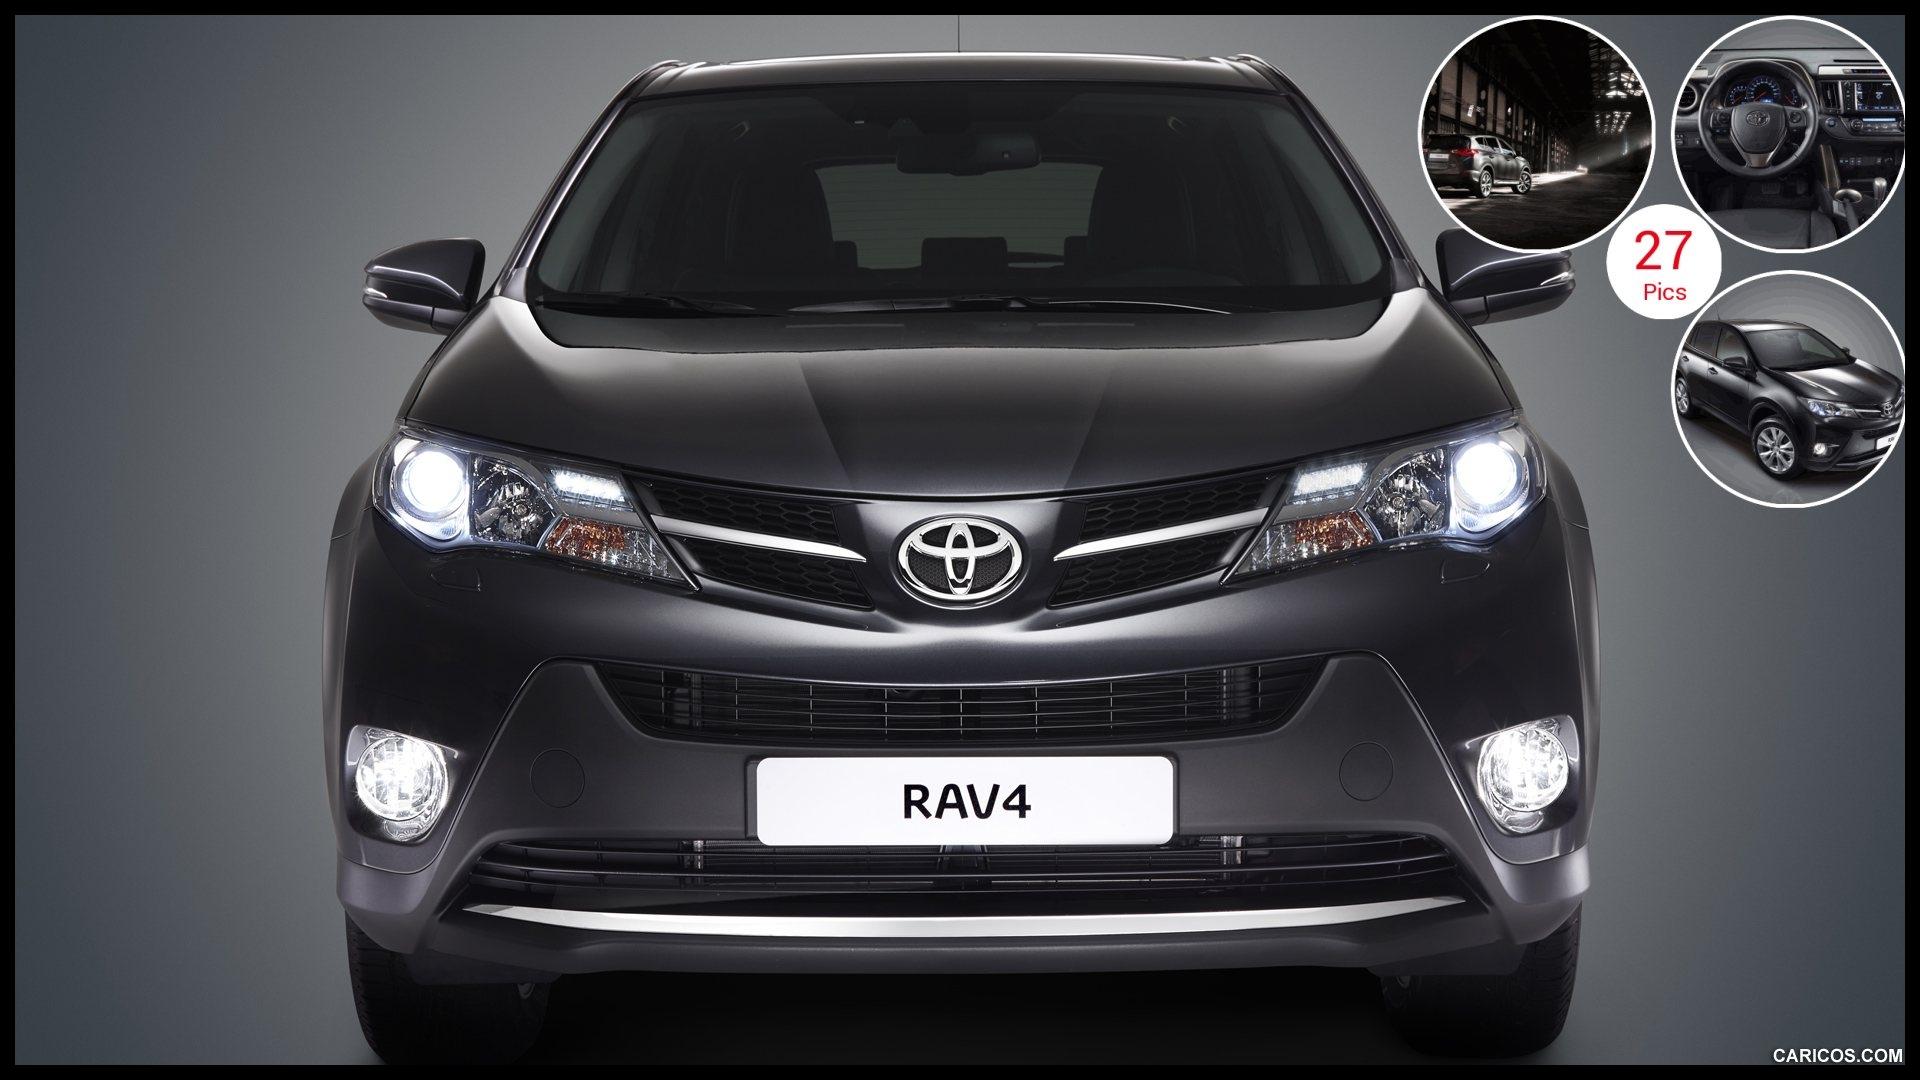 2013 Toyota RAV4 European Version Front Wallpaper